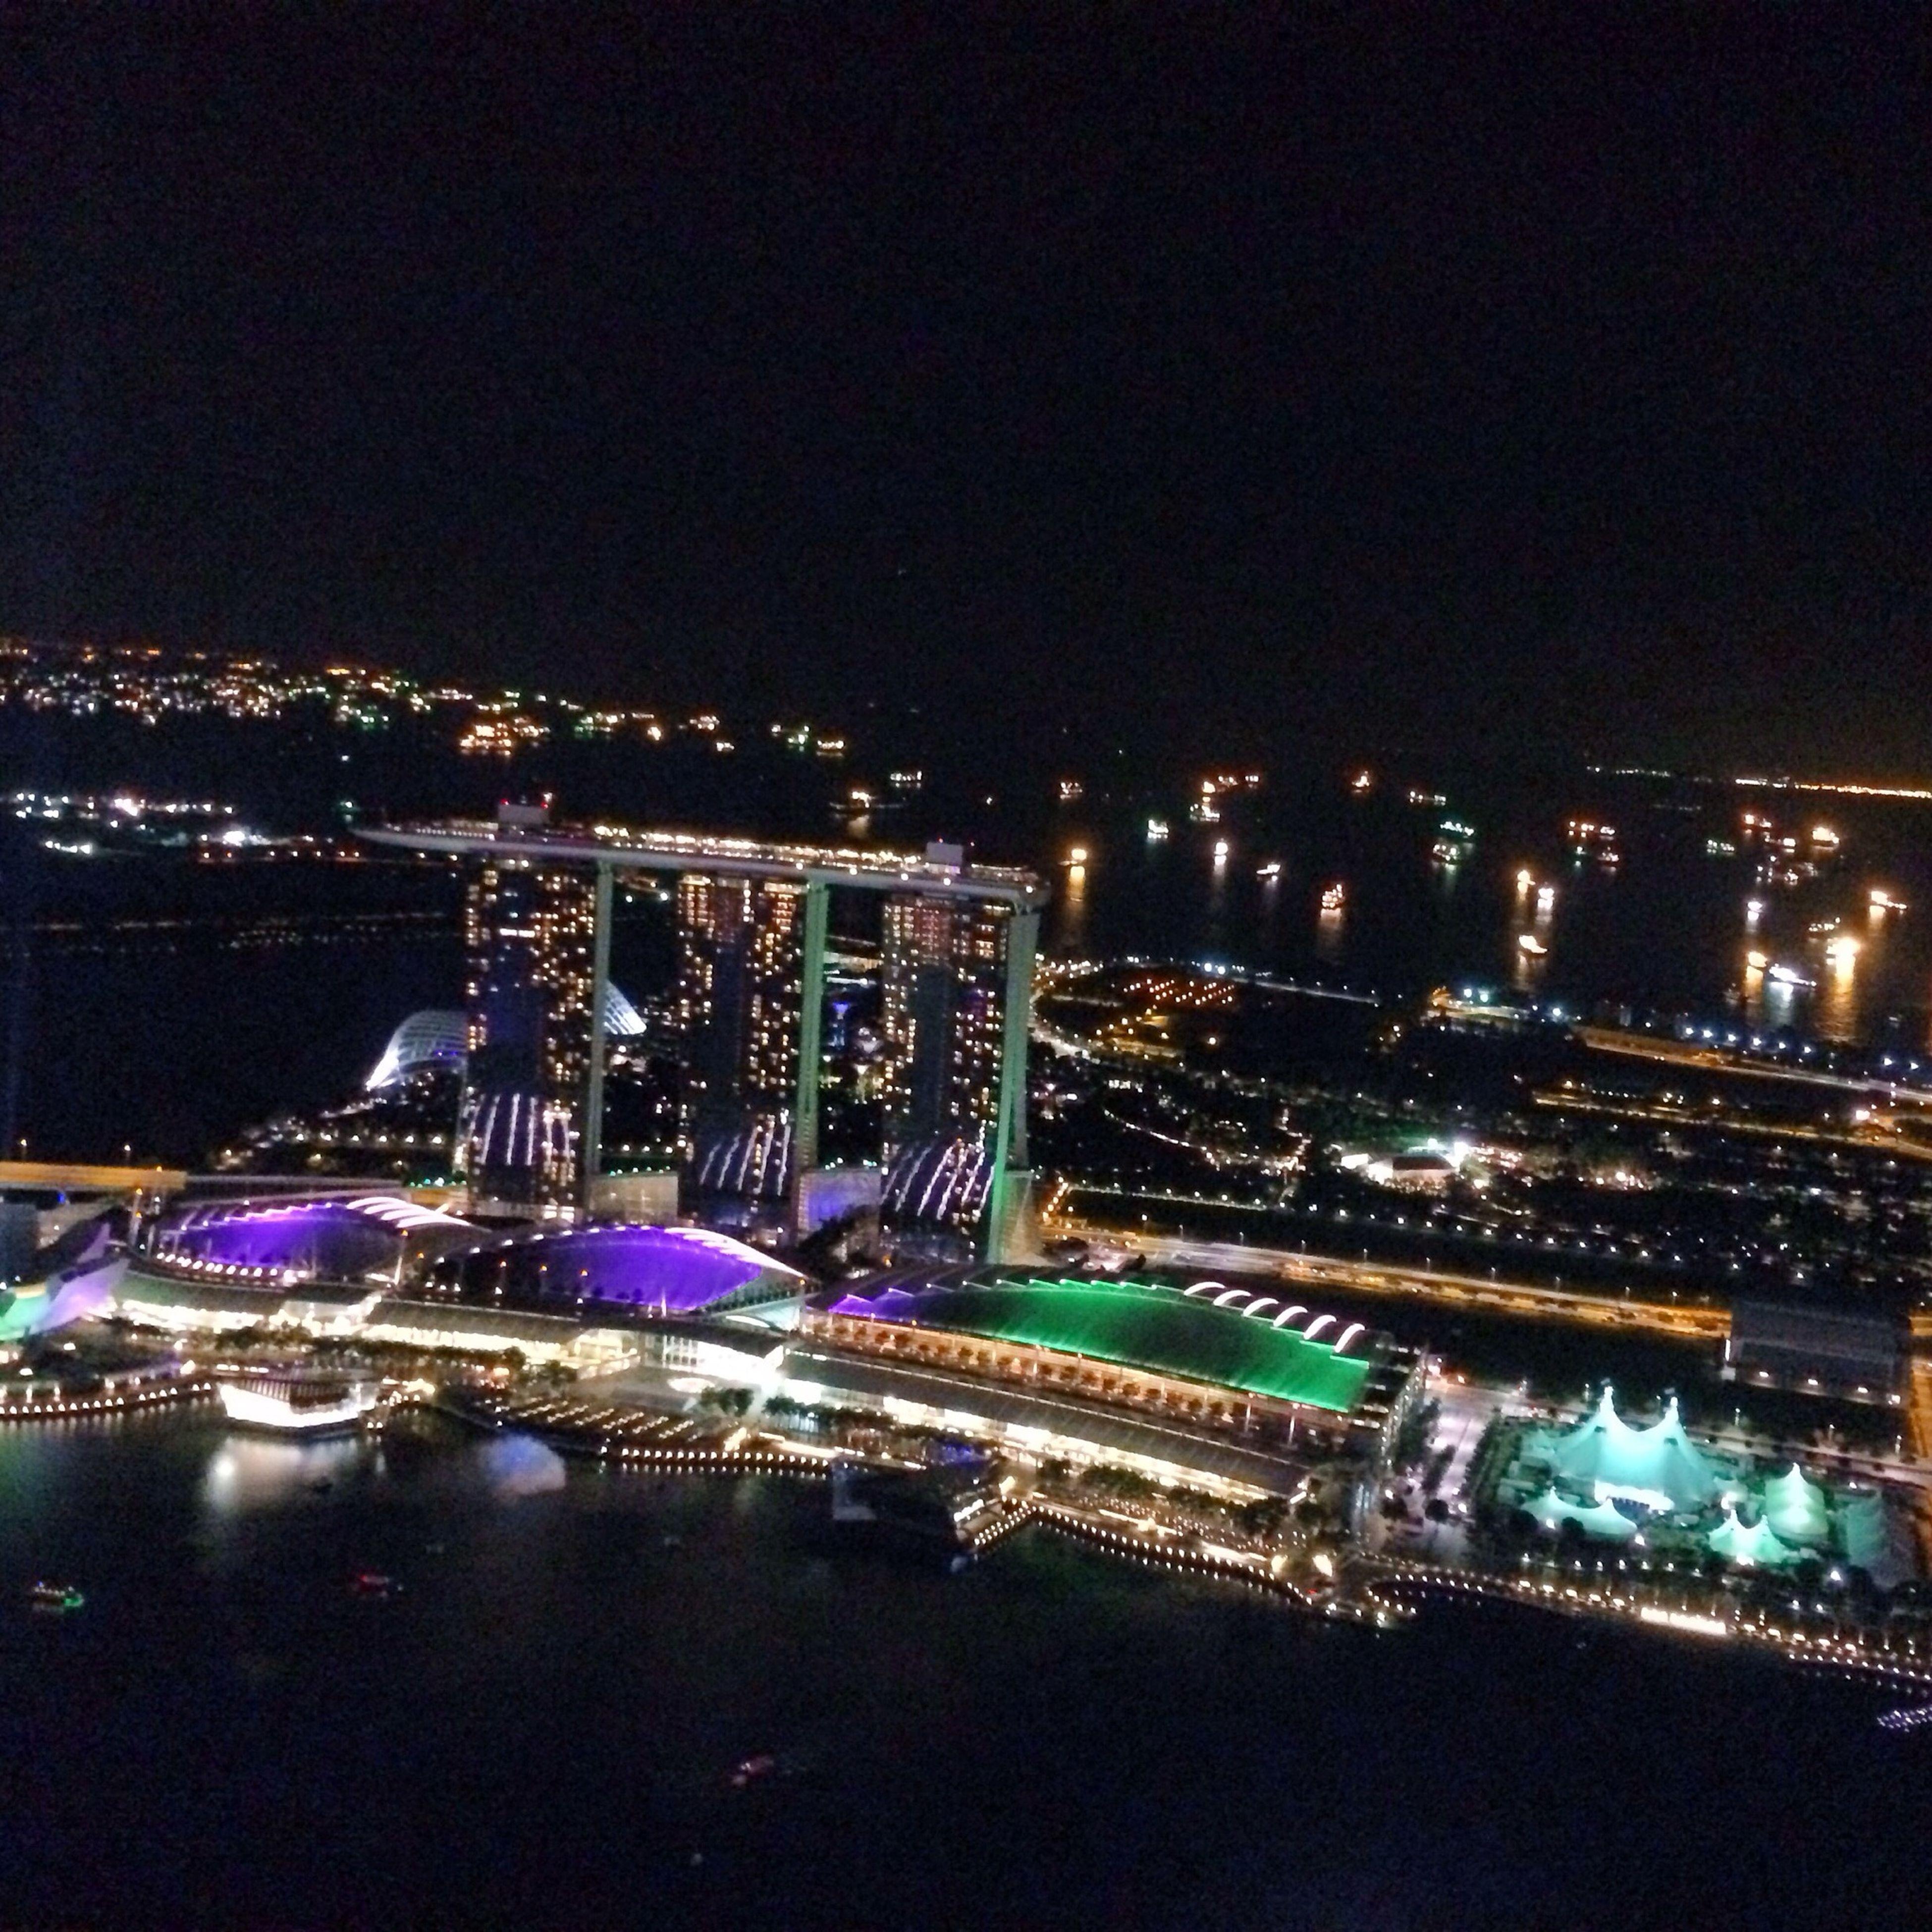 1 Altitude Bar Marina Bay Sands Roof Top The Purist (no Edit, No Filter)